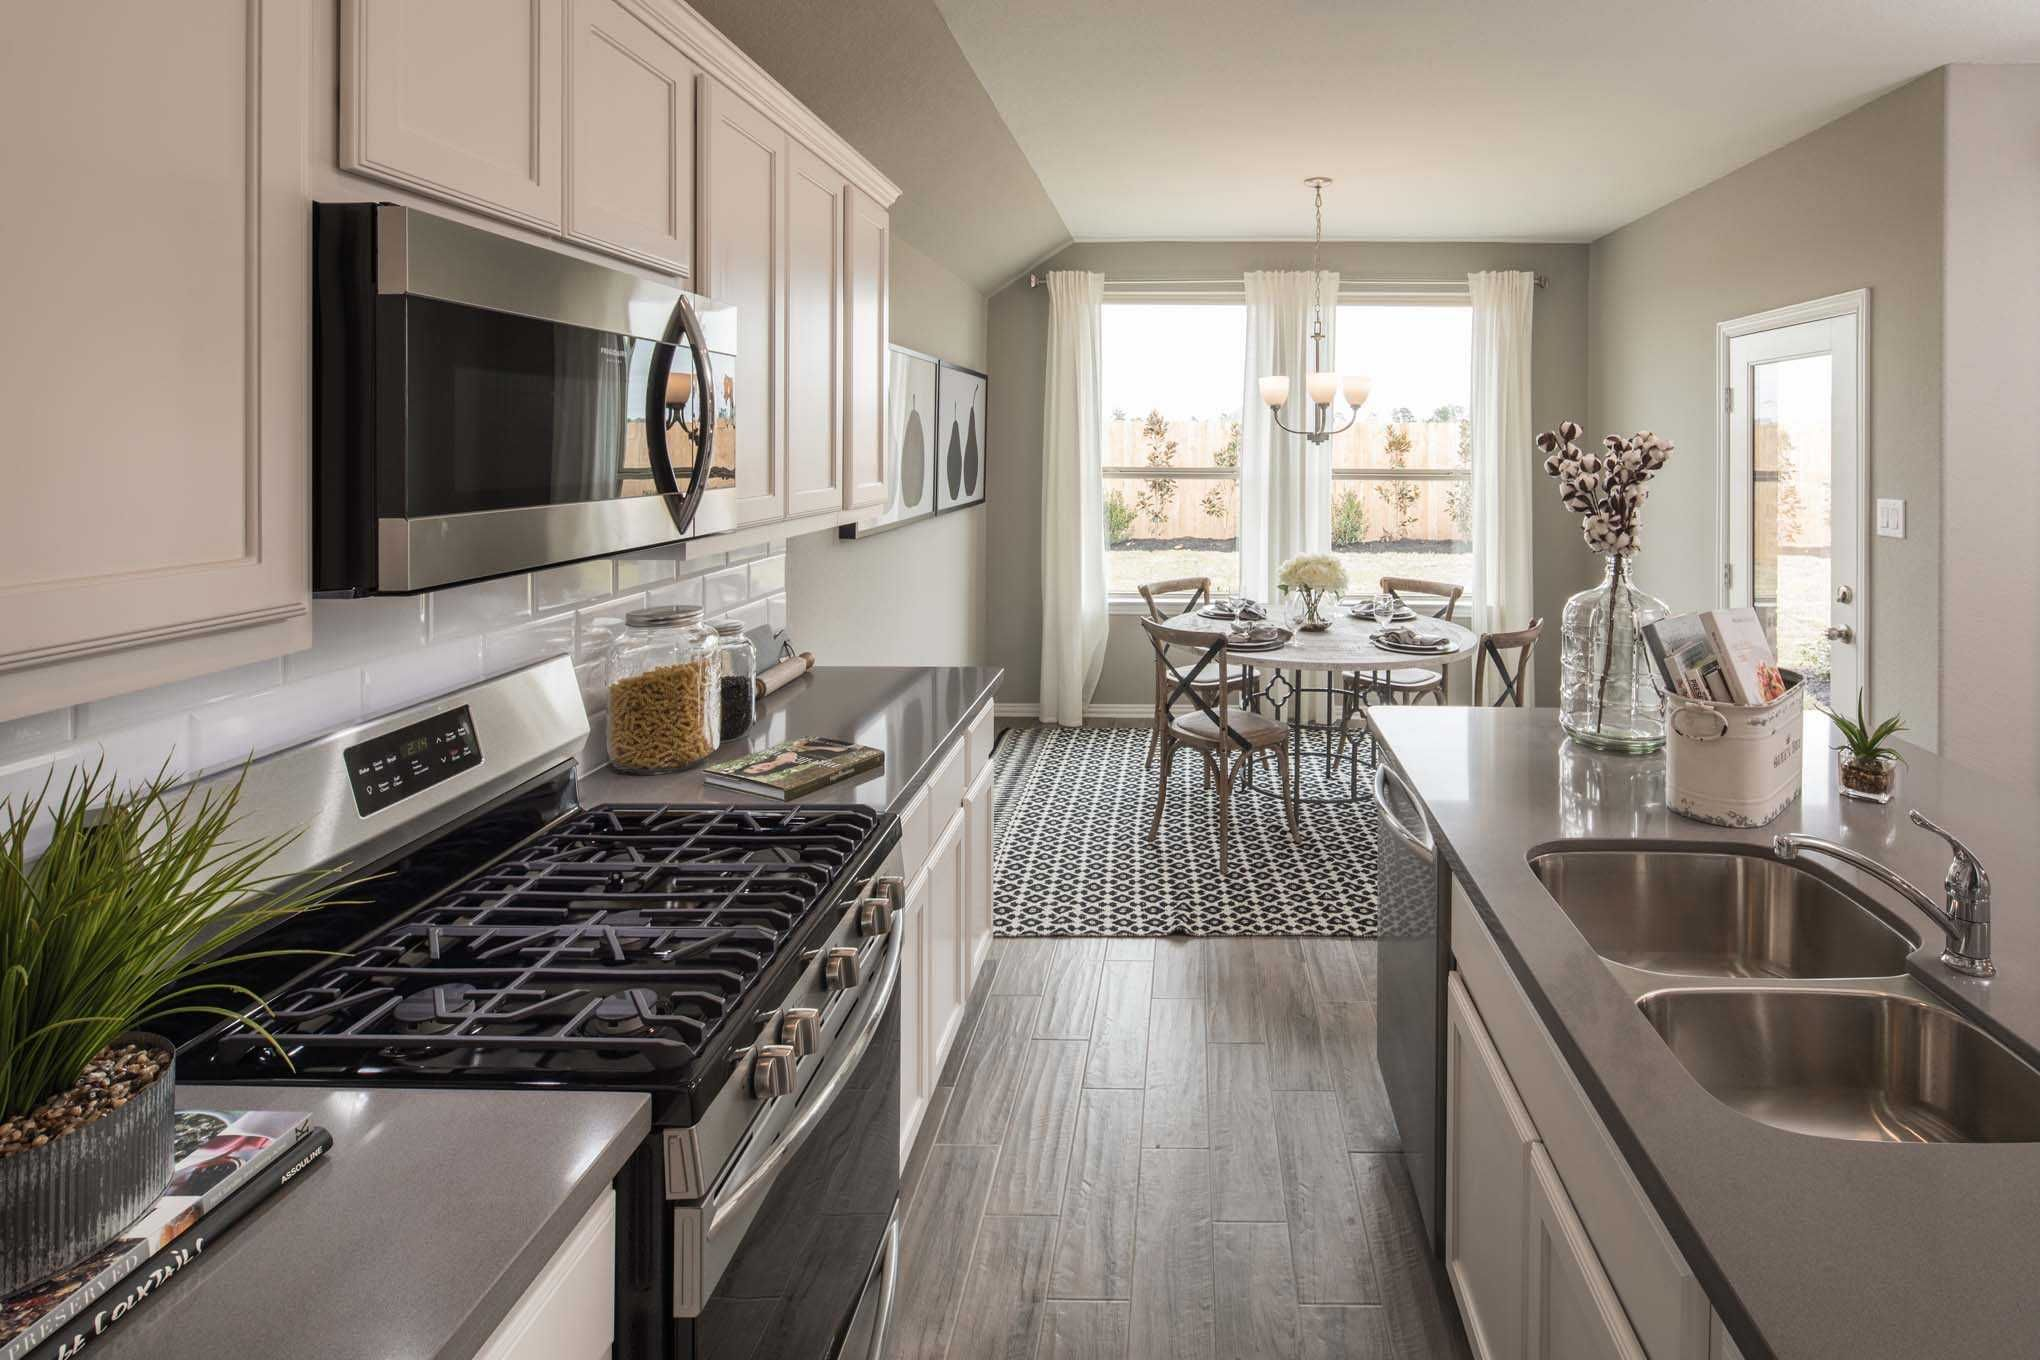 Highland Homes Ashwood Model Home In Houston Texas Laurel Glen Amazing New Model Kitchen Design Inspiration